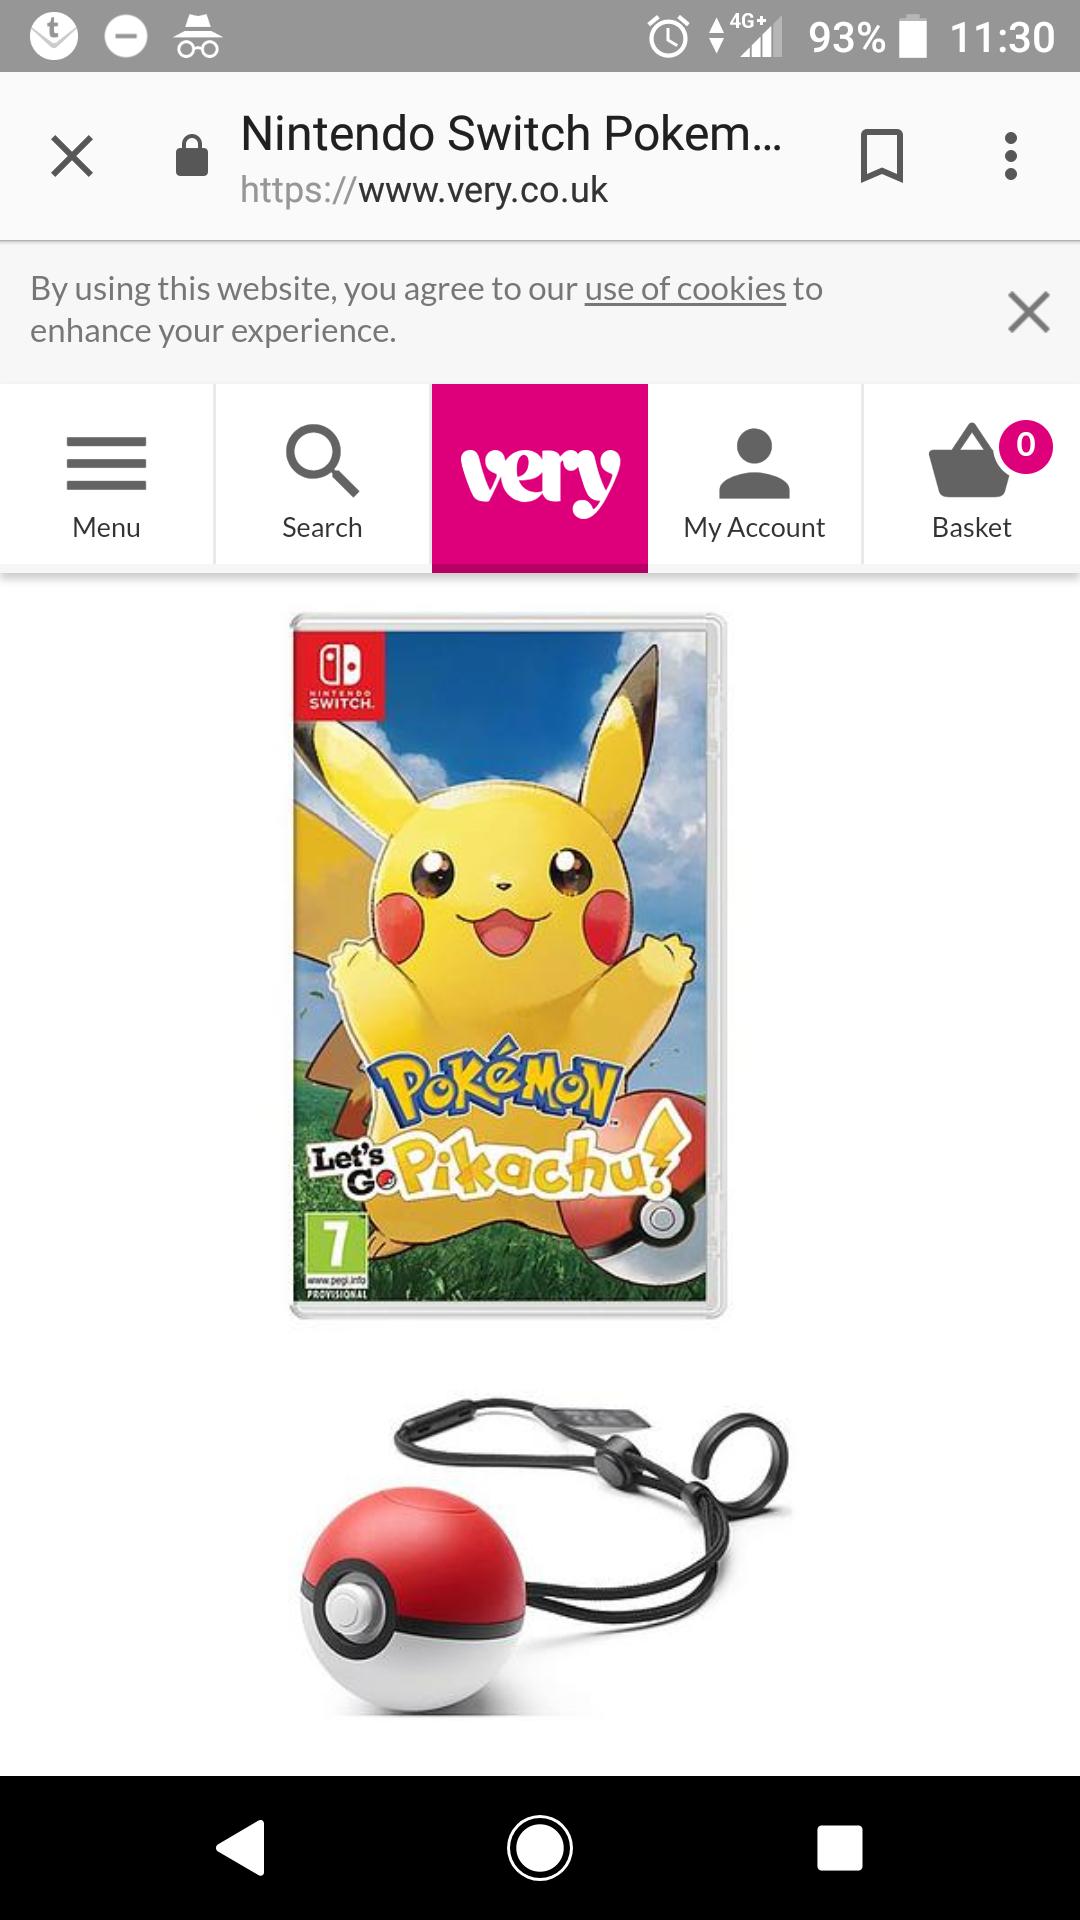 Let's Go Pikachu & Pokeball Plus Bundle £74.99 @ Very